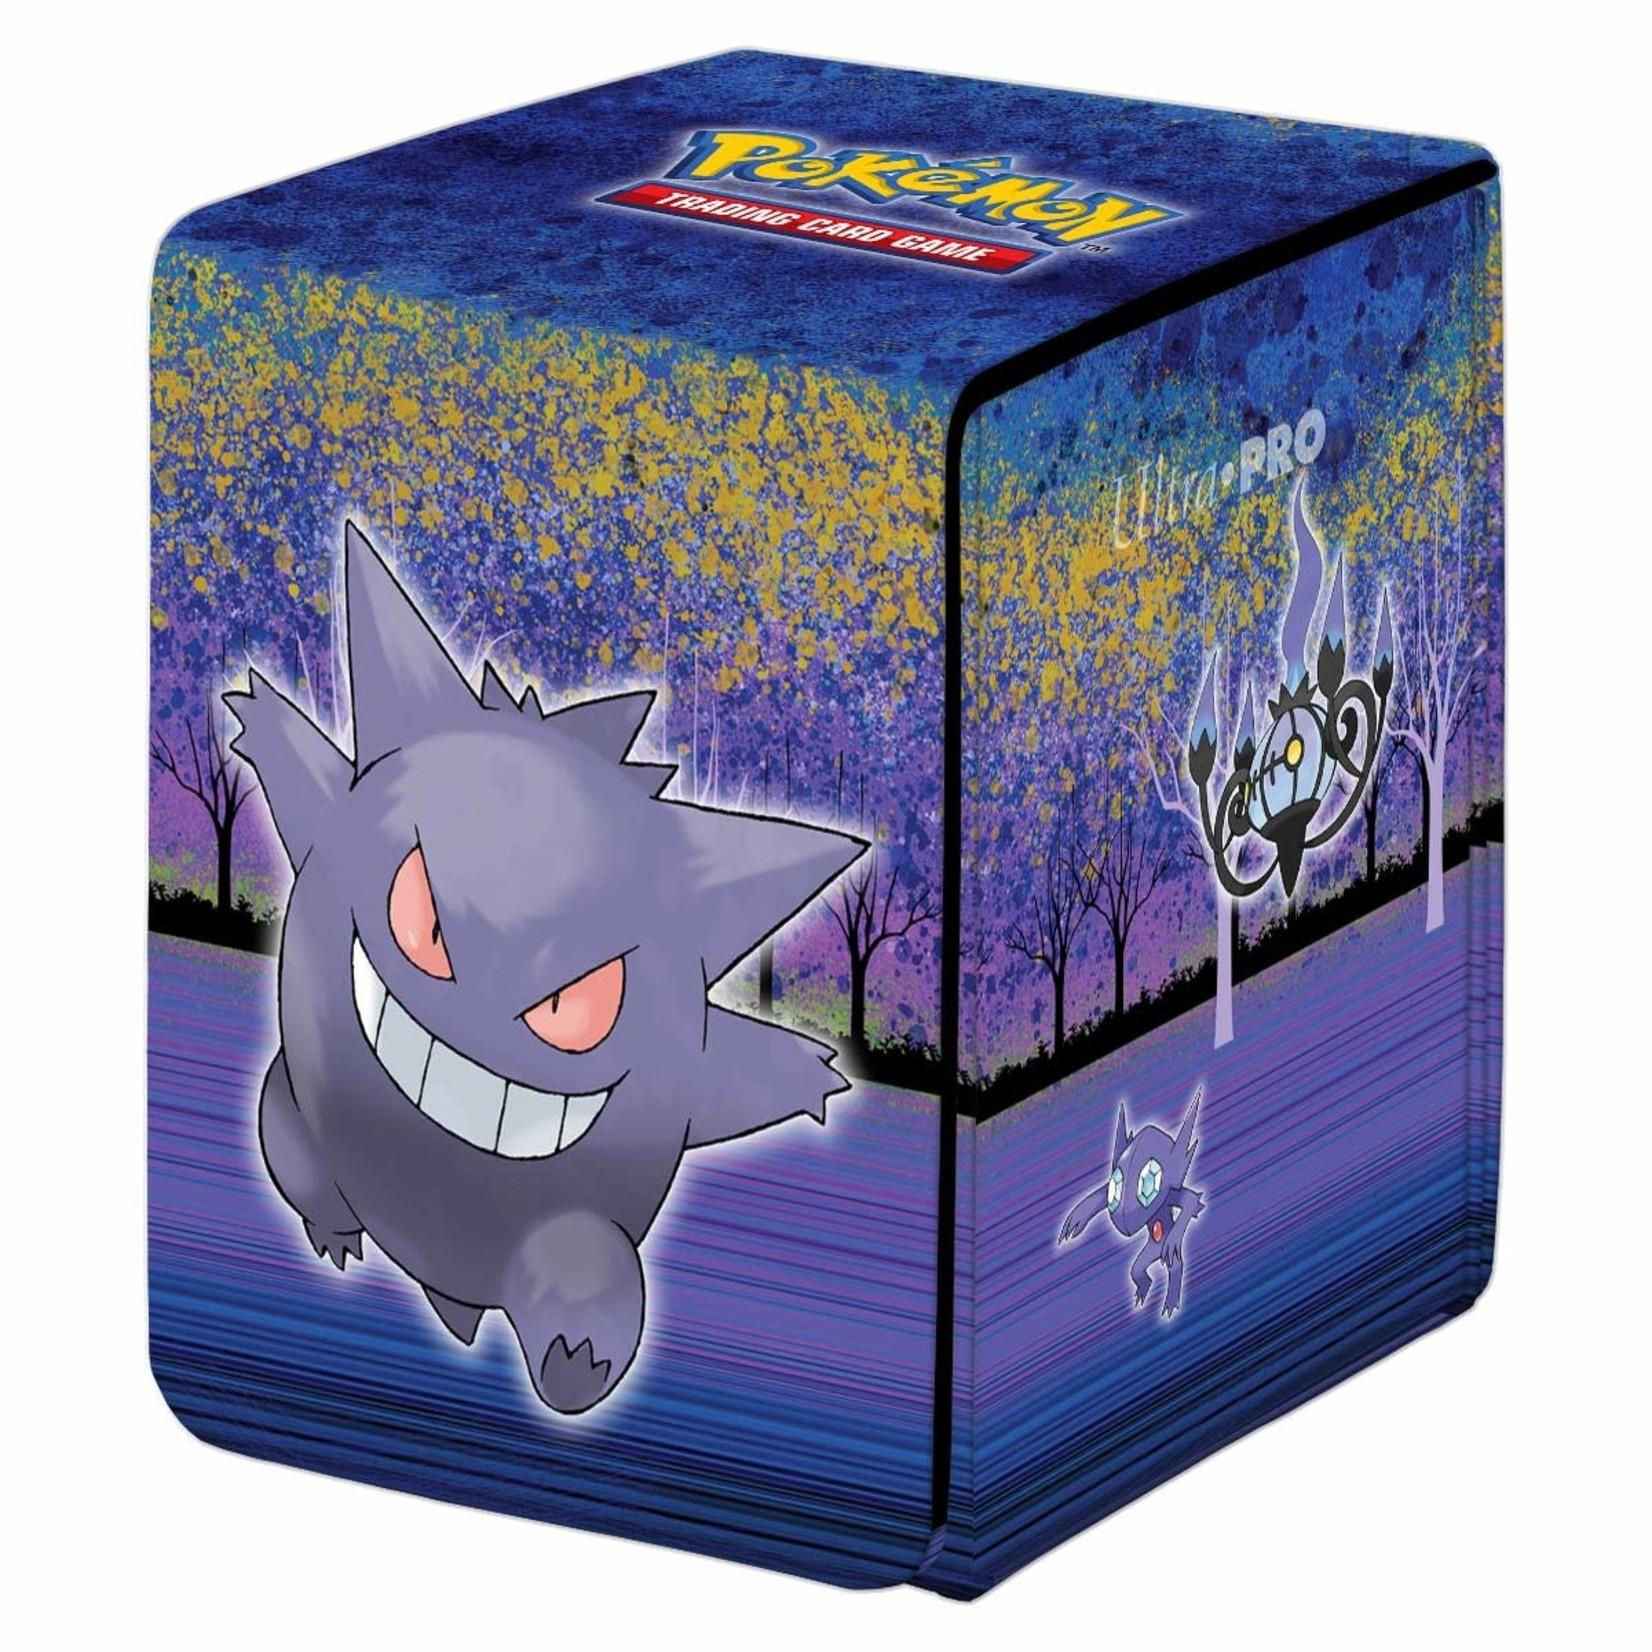 Ultra Pro Alcove Flip Pokemon Gallery Series Haunted Hollow Deck Box